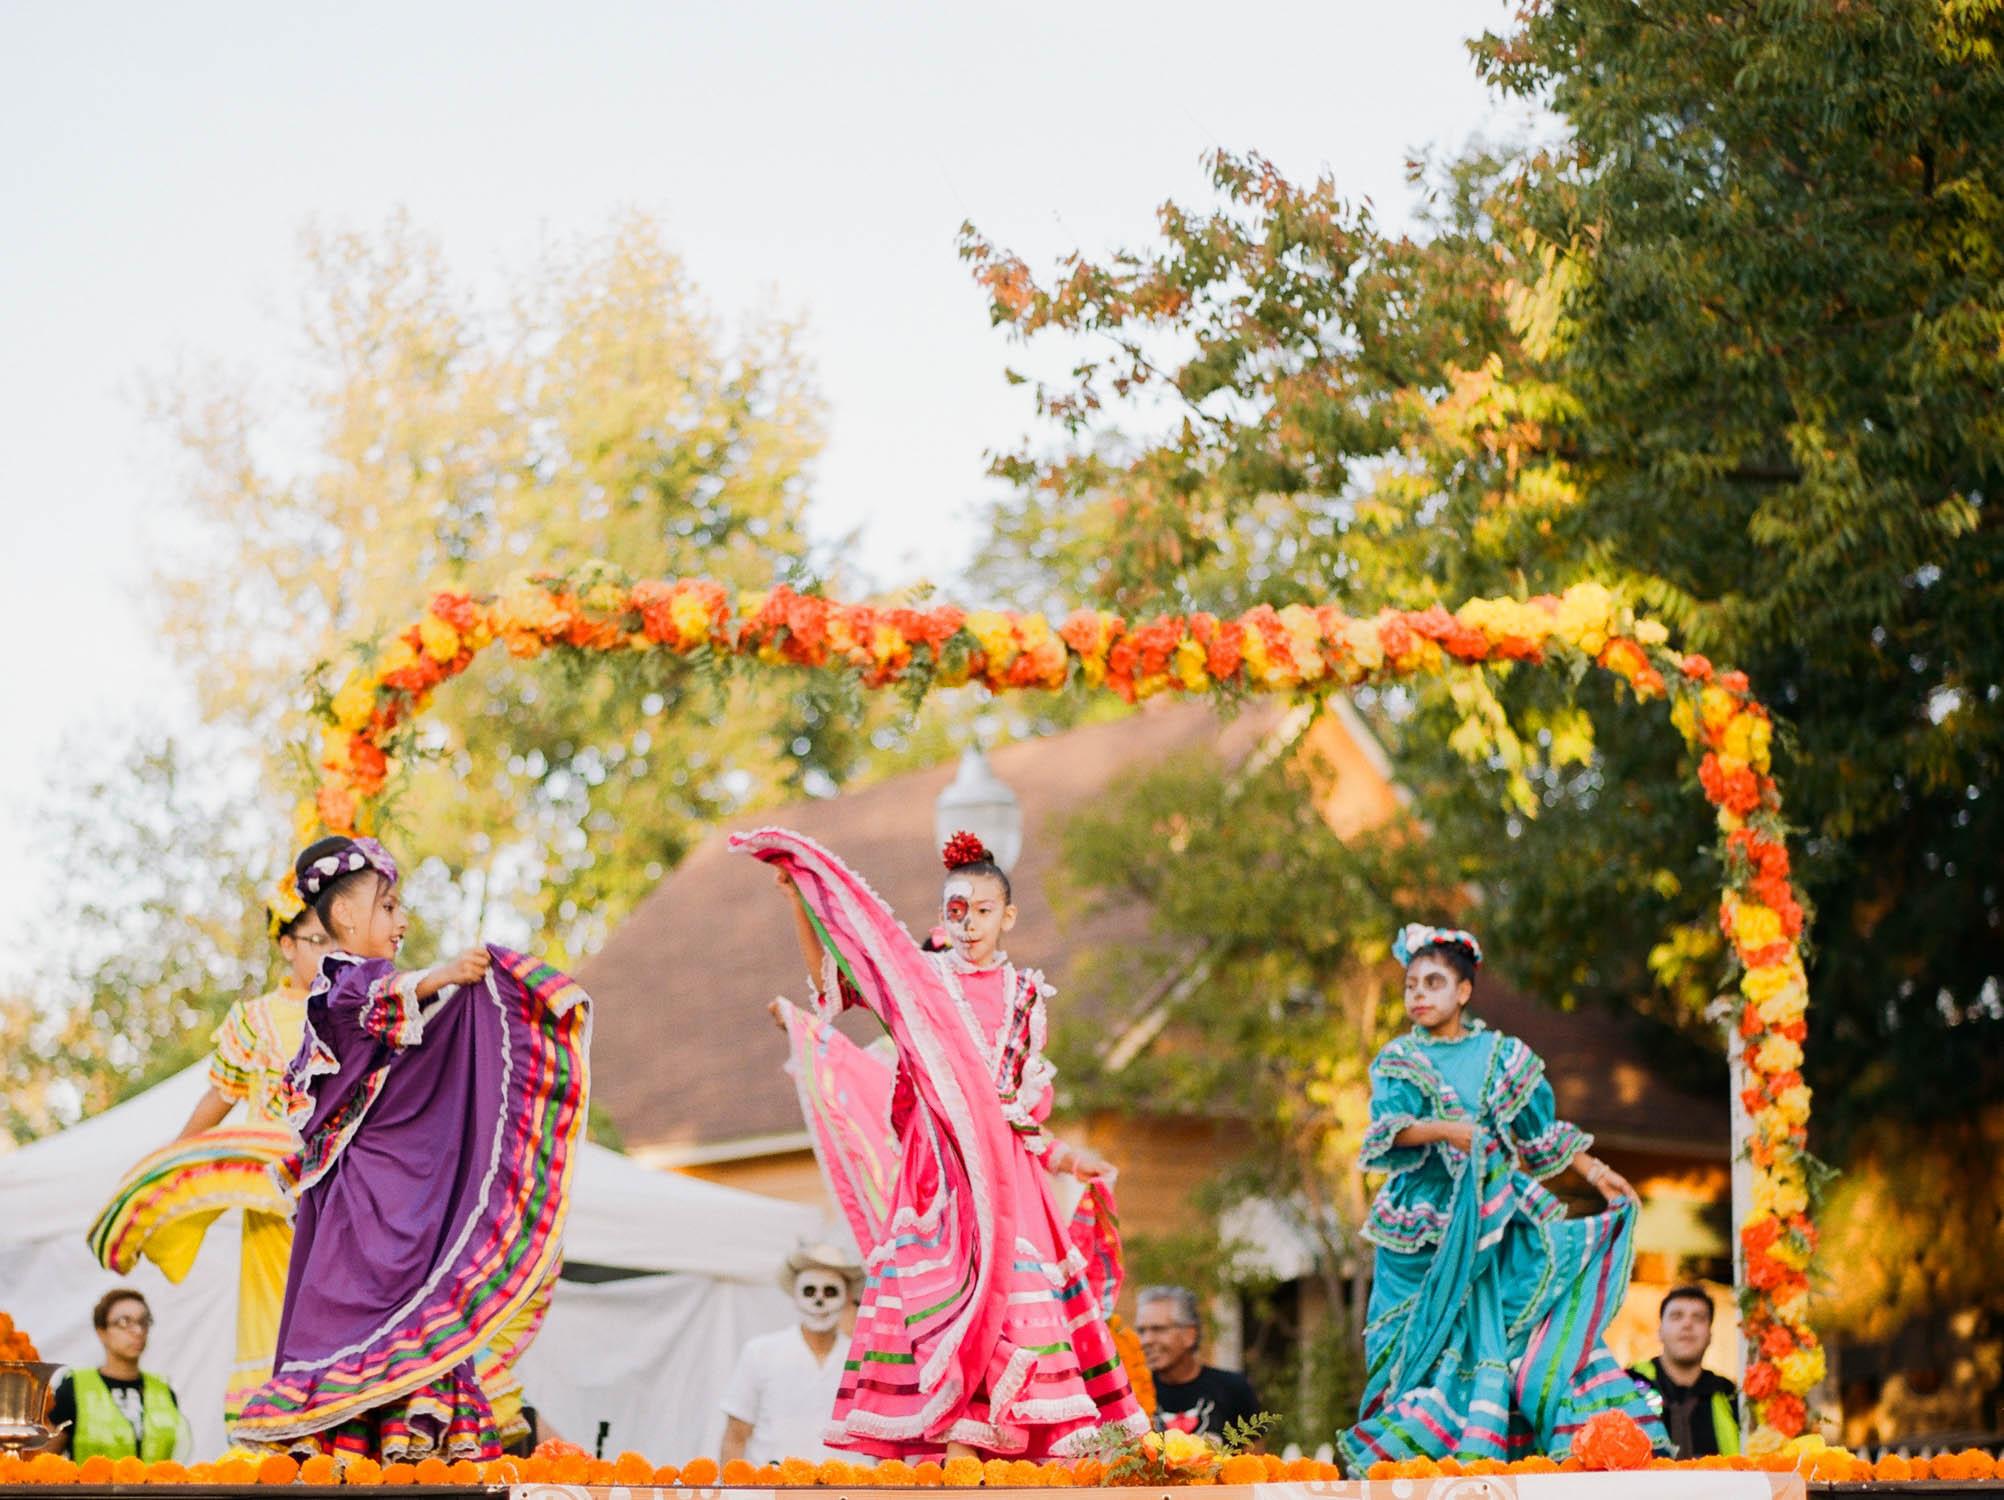 girls dance at Oak Park Dia de los Muertos in Sacramento by Rachel Sima Photography